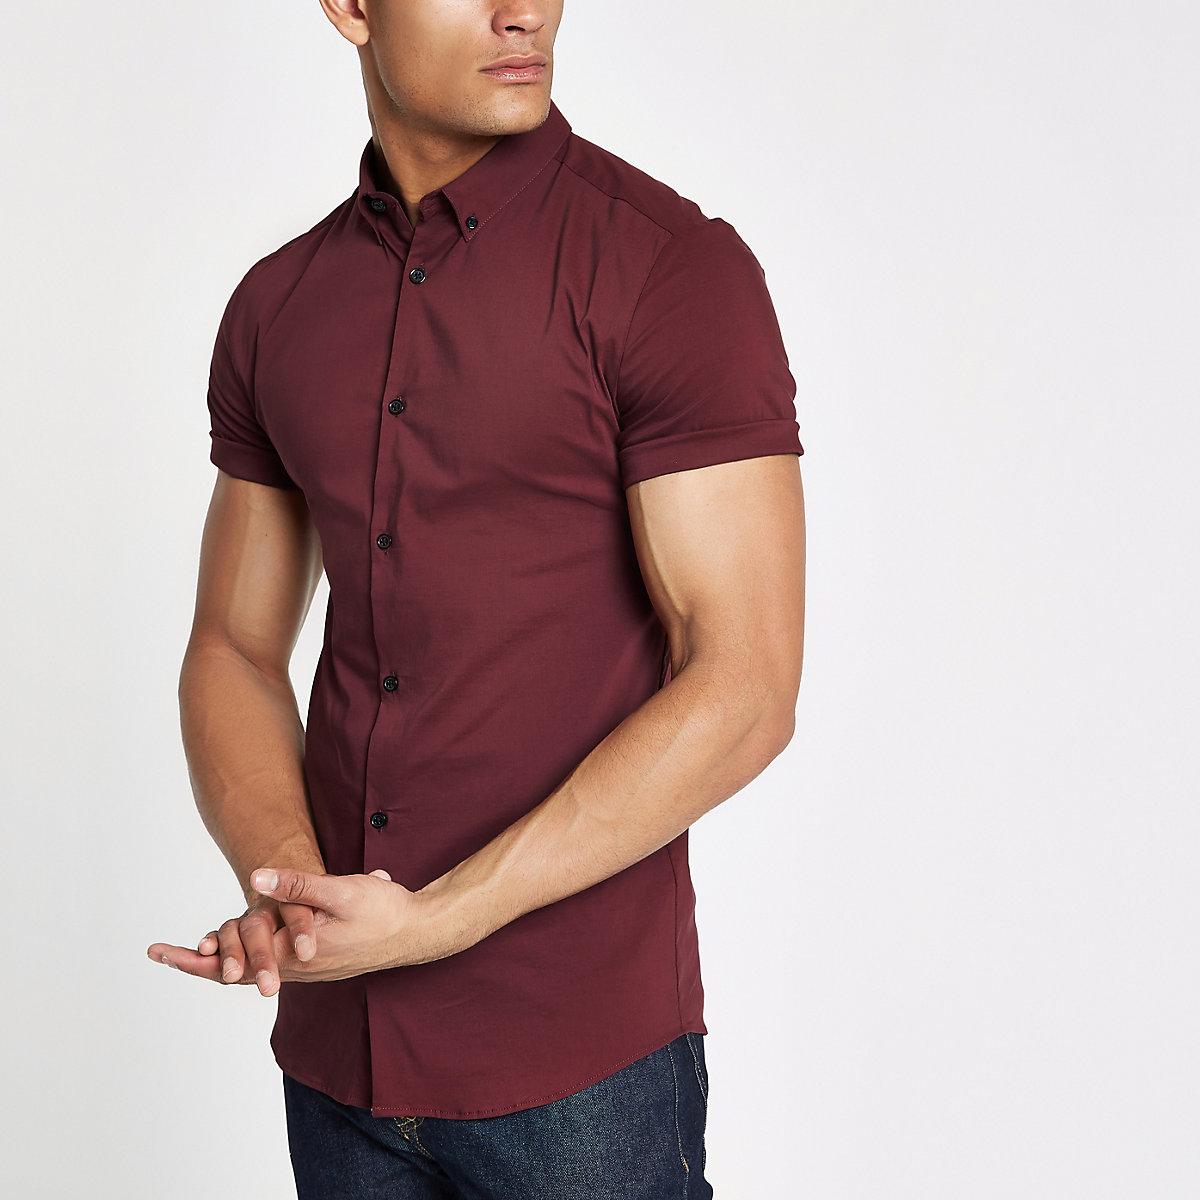 Red poplin muscle fit short sleeve shirt